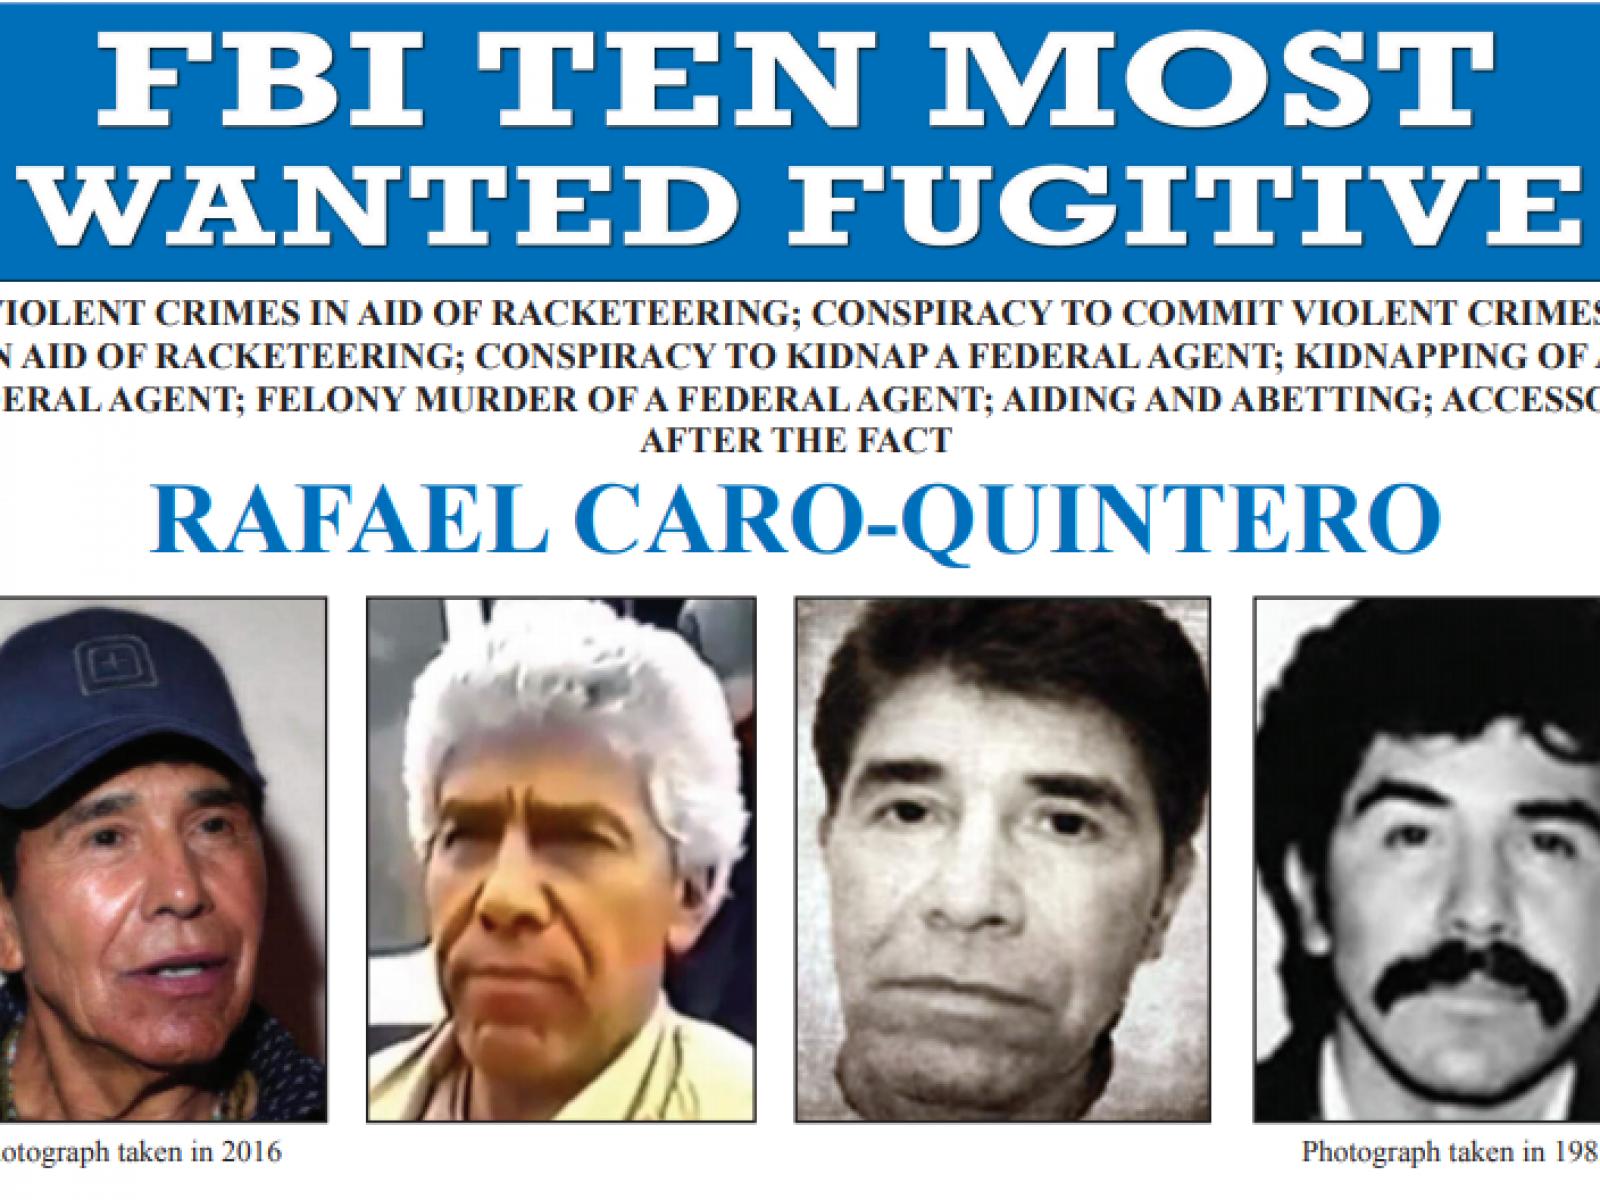 Who Is Rafael Caro Quintero? FBI Offers $20 Million Reward for Most